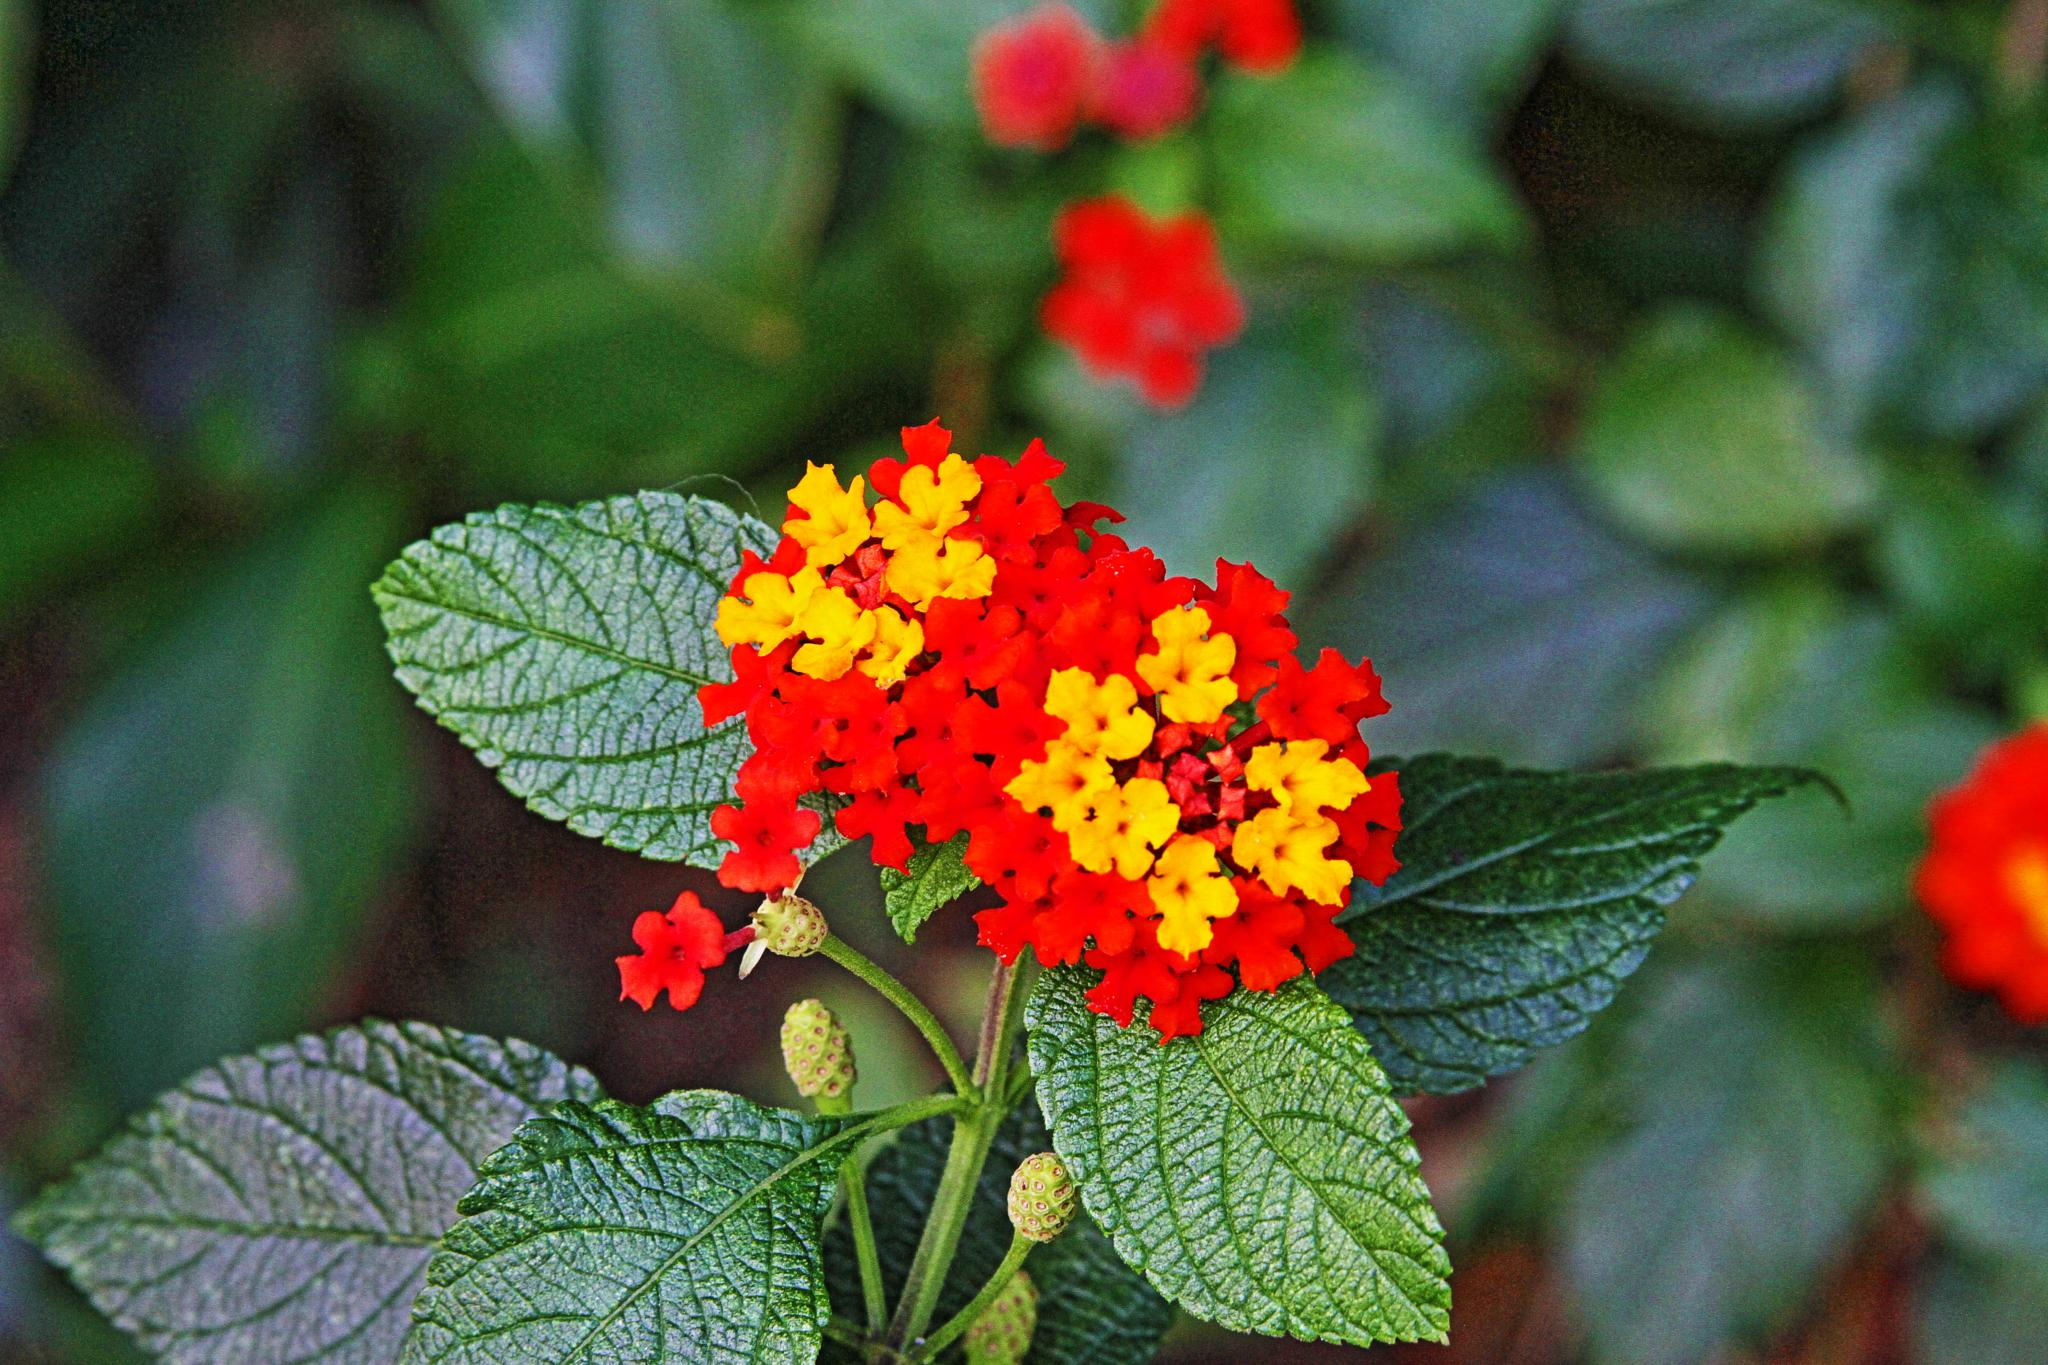 flower cluster by Robert Pelletier